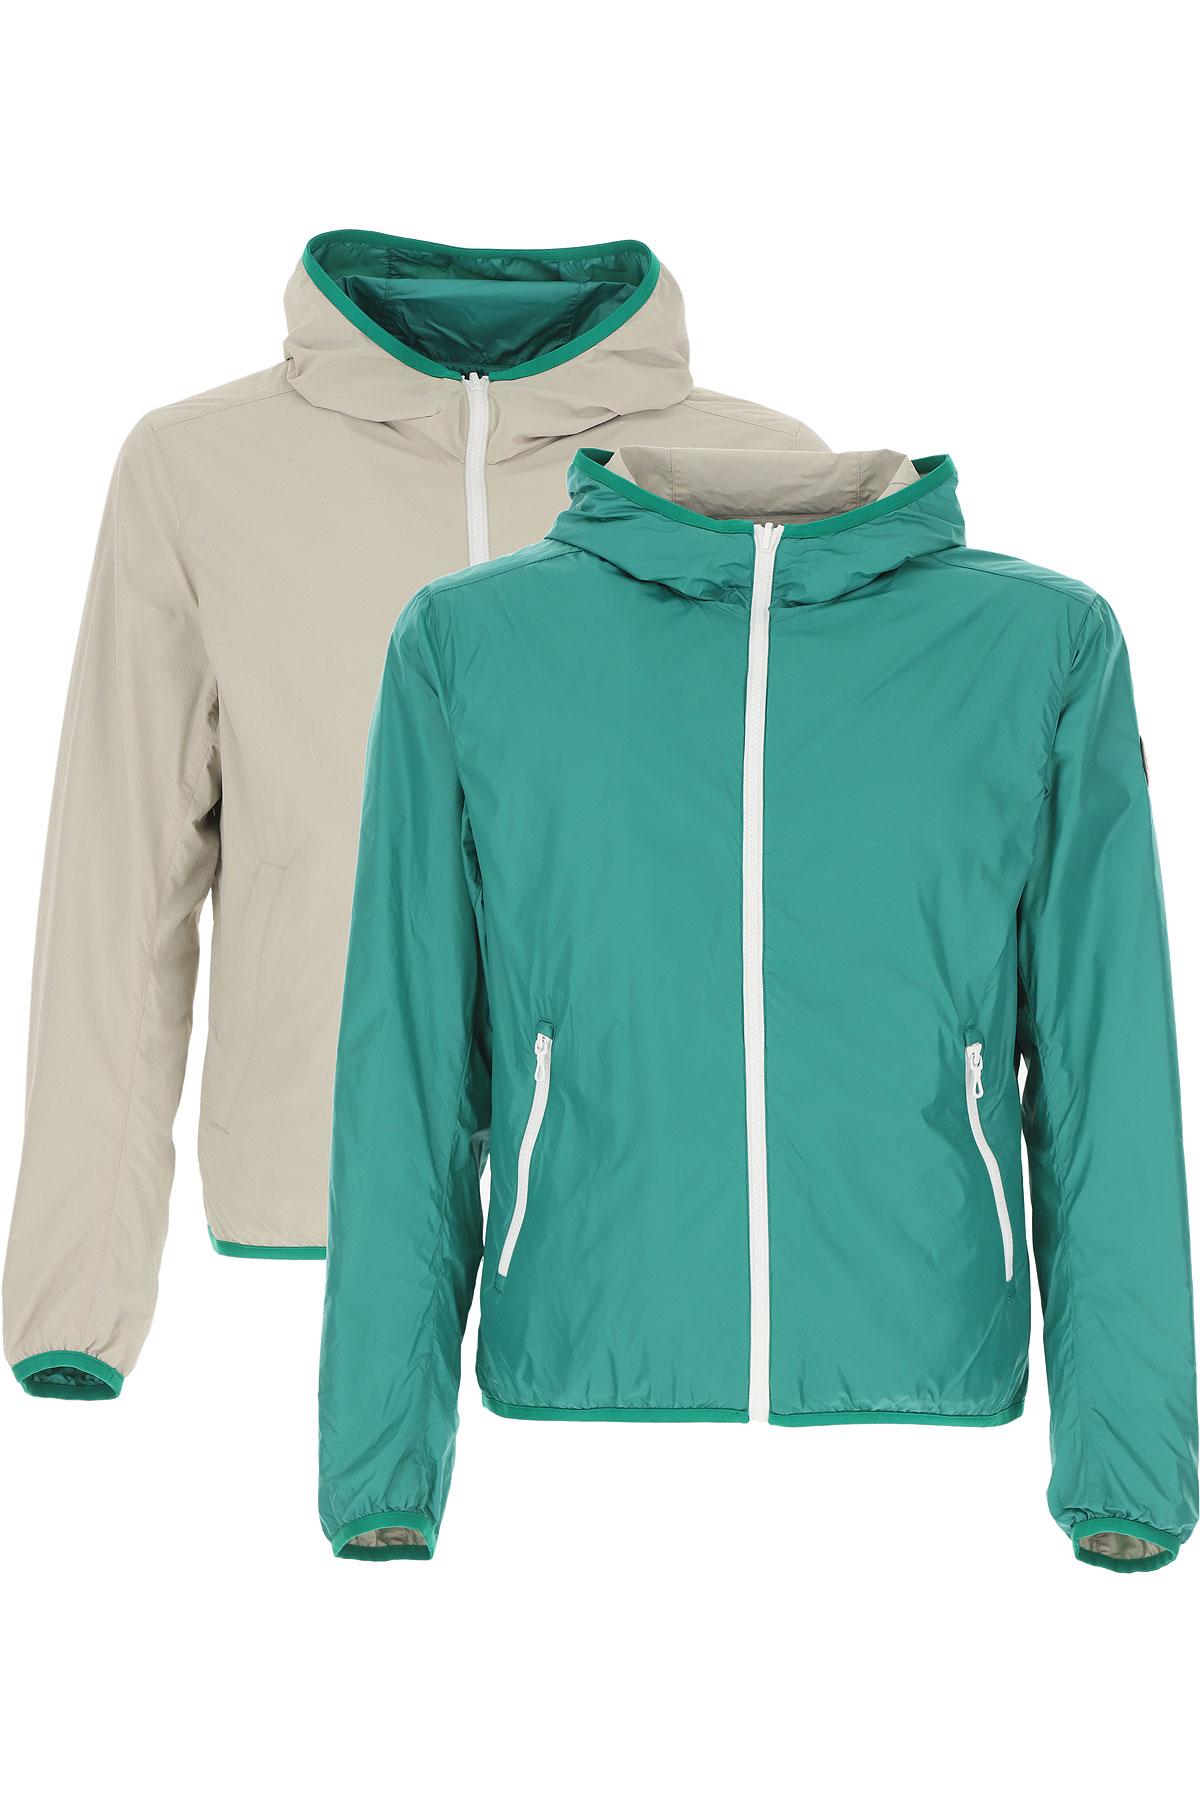 Colmar Jacket for Men On Sale, Medium Green, polyester, 2019, L M XL